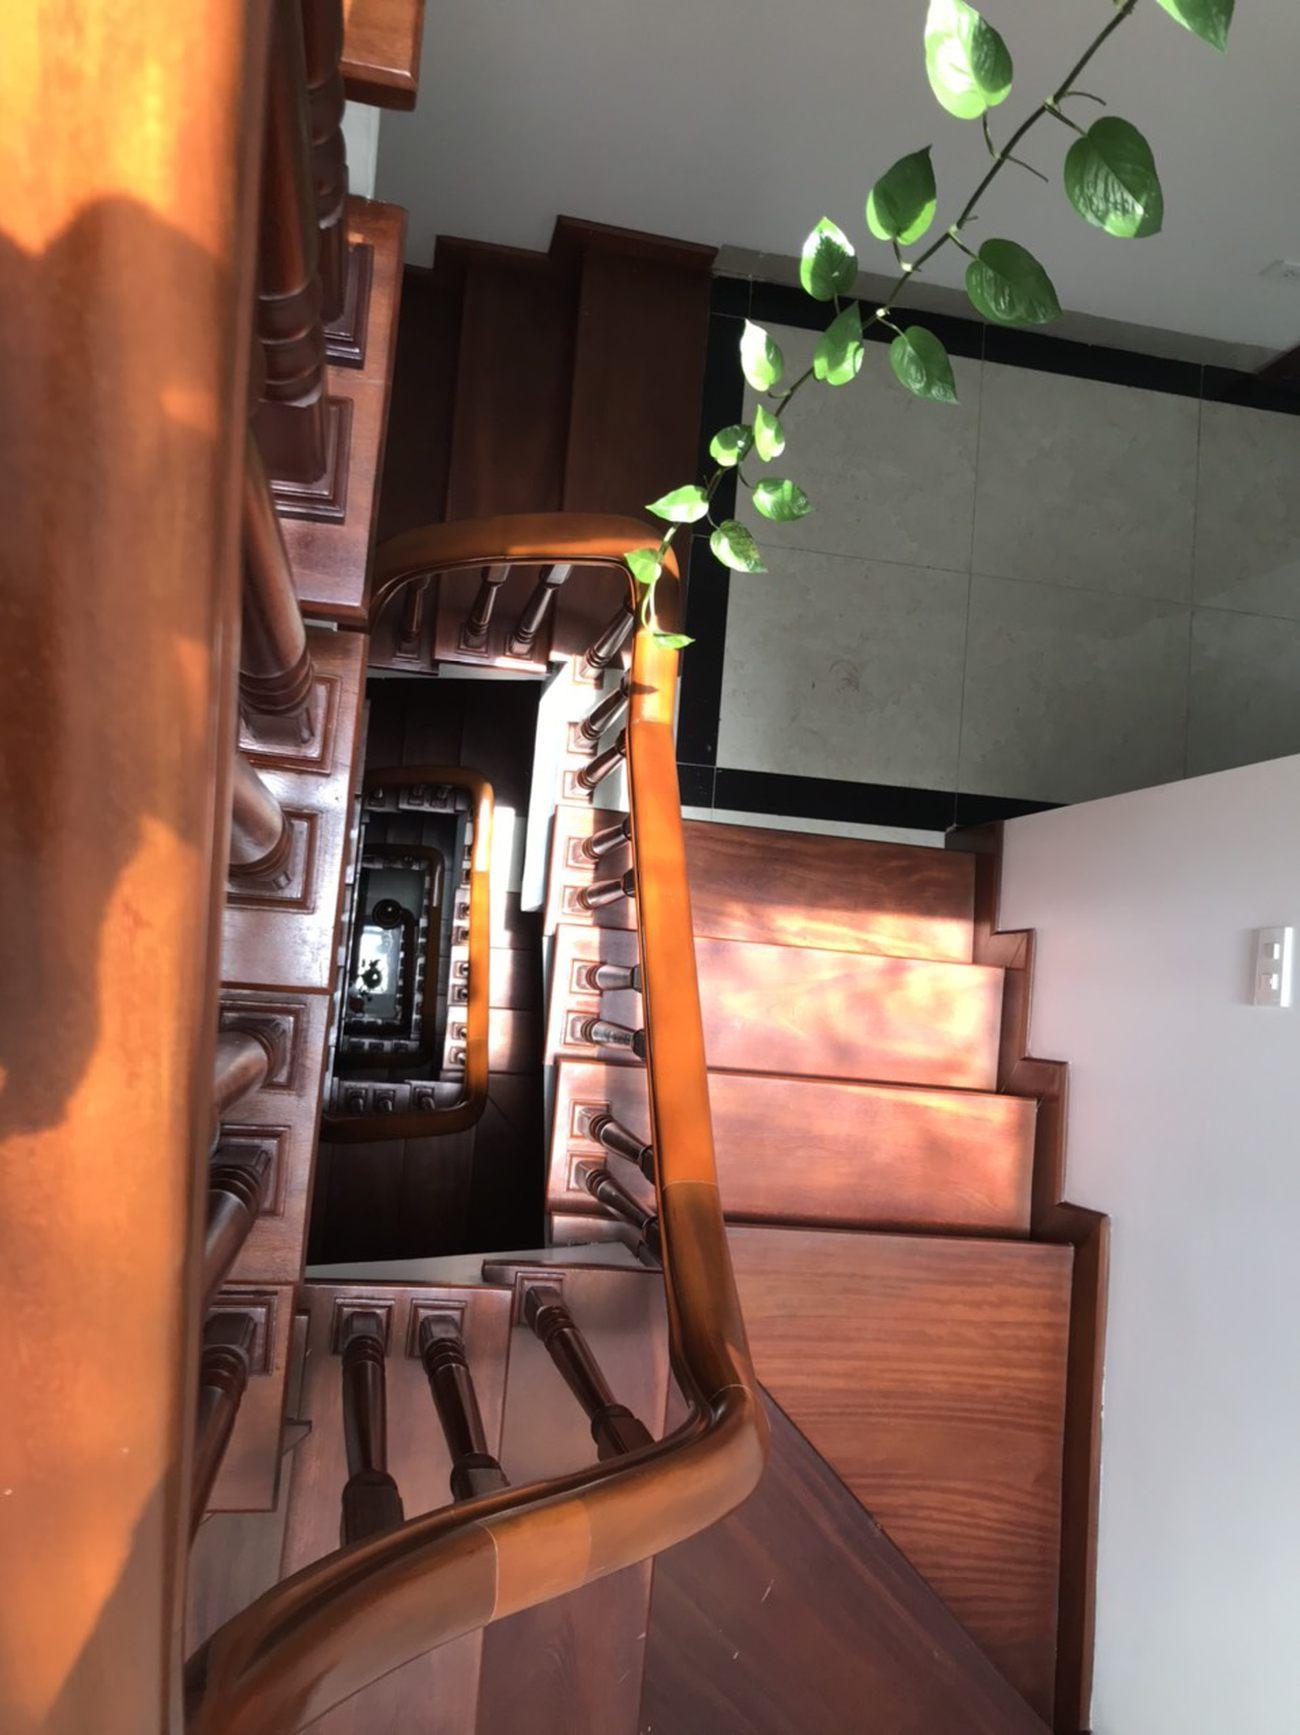 ho-mslinh-s-house-in-long-bien-hanoi-stairsjpg-1629110262.jpg